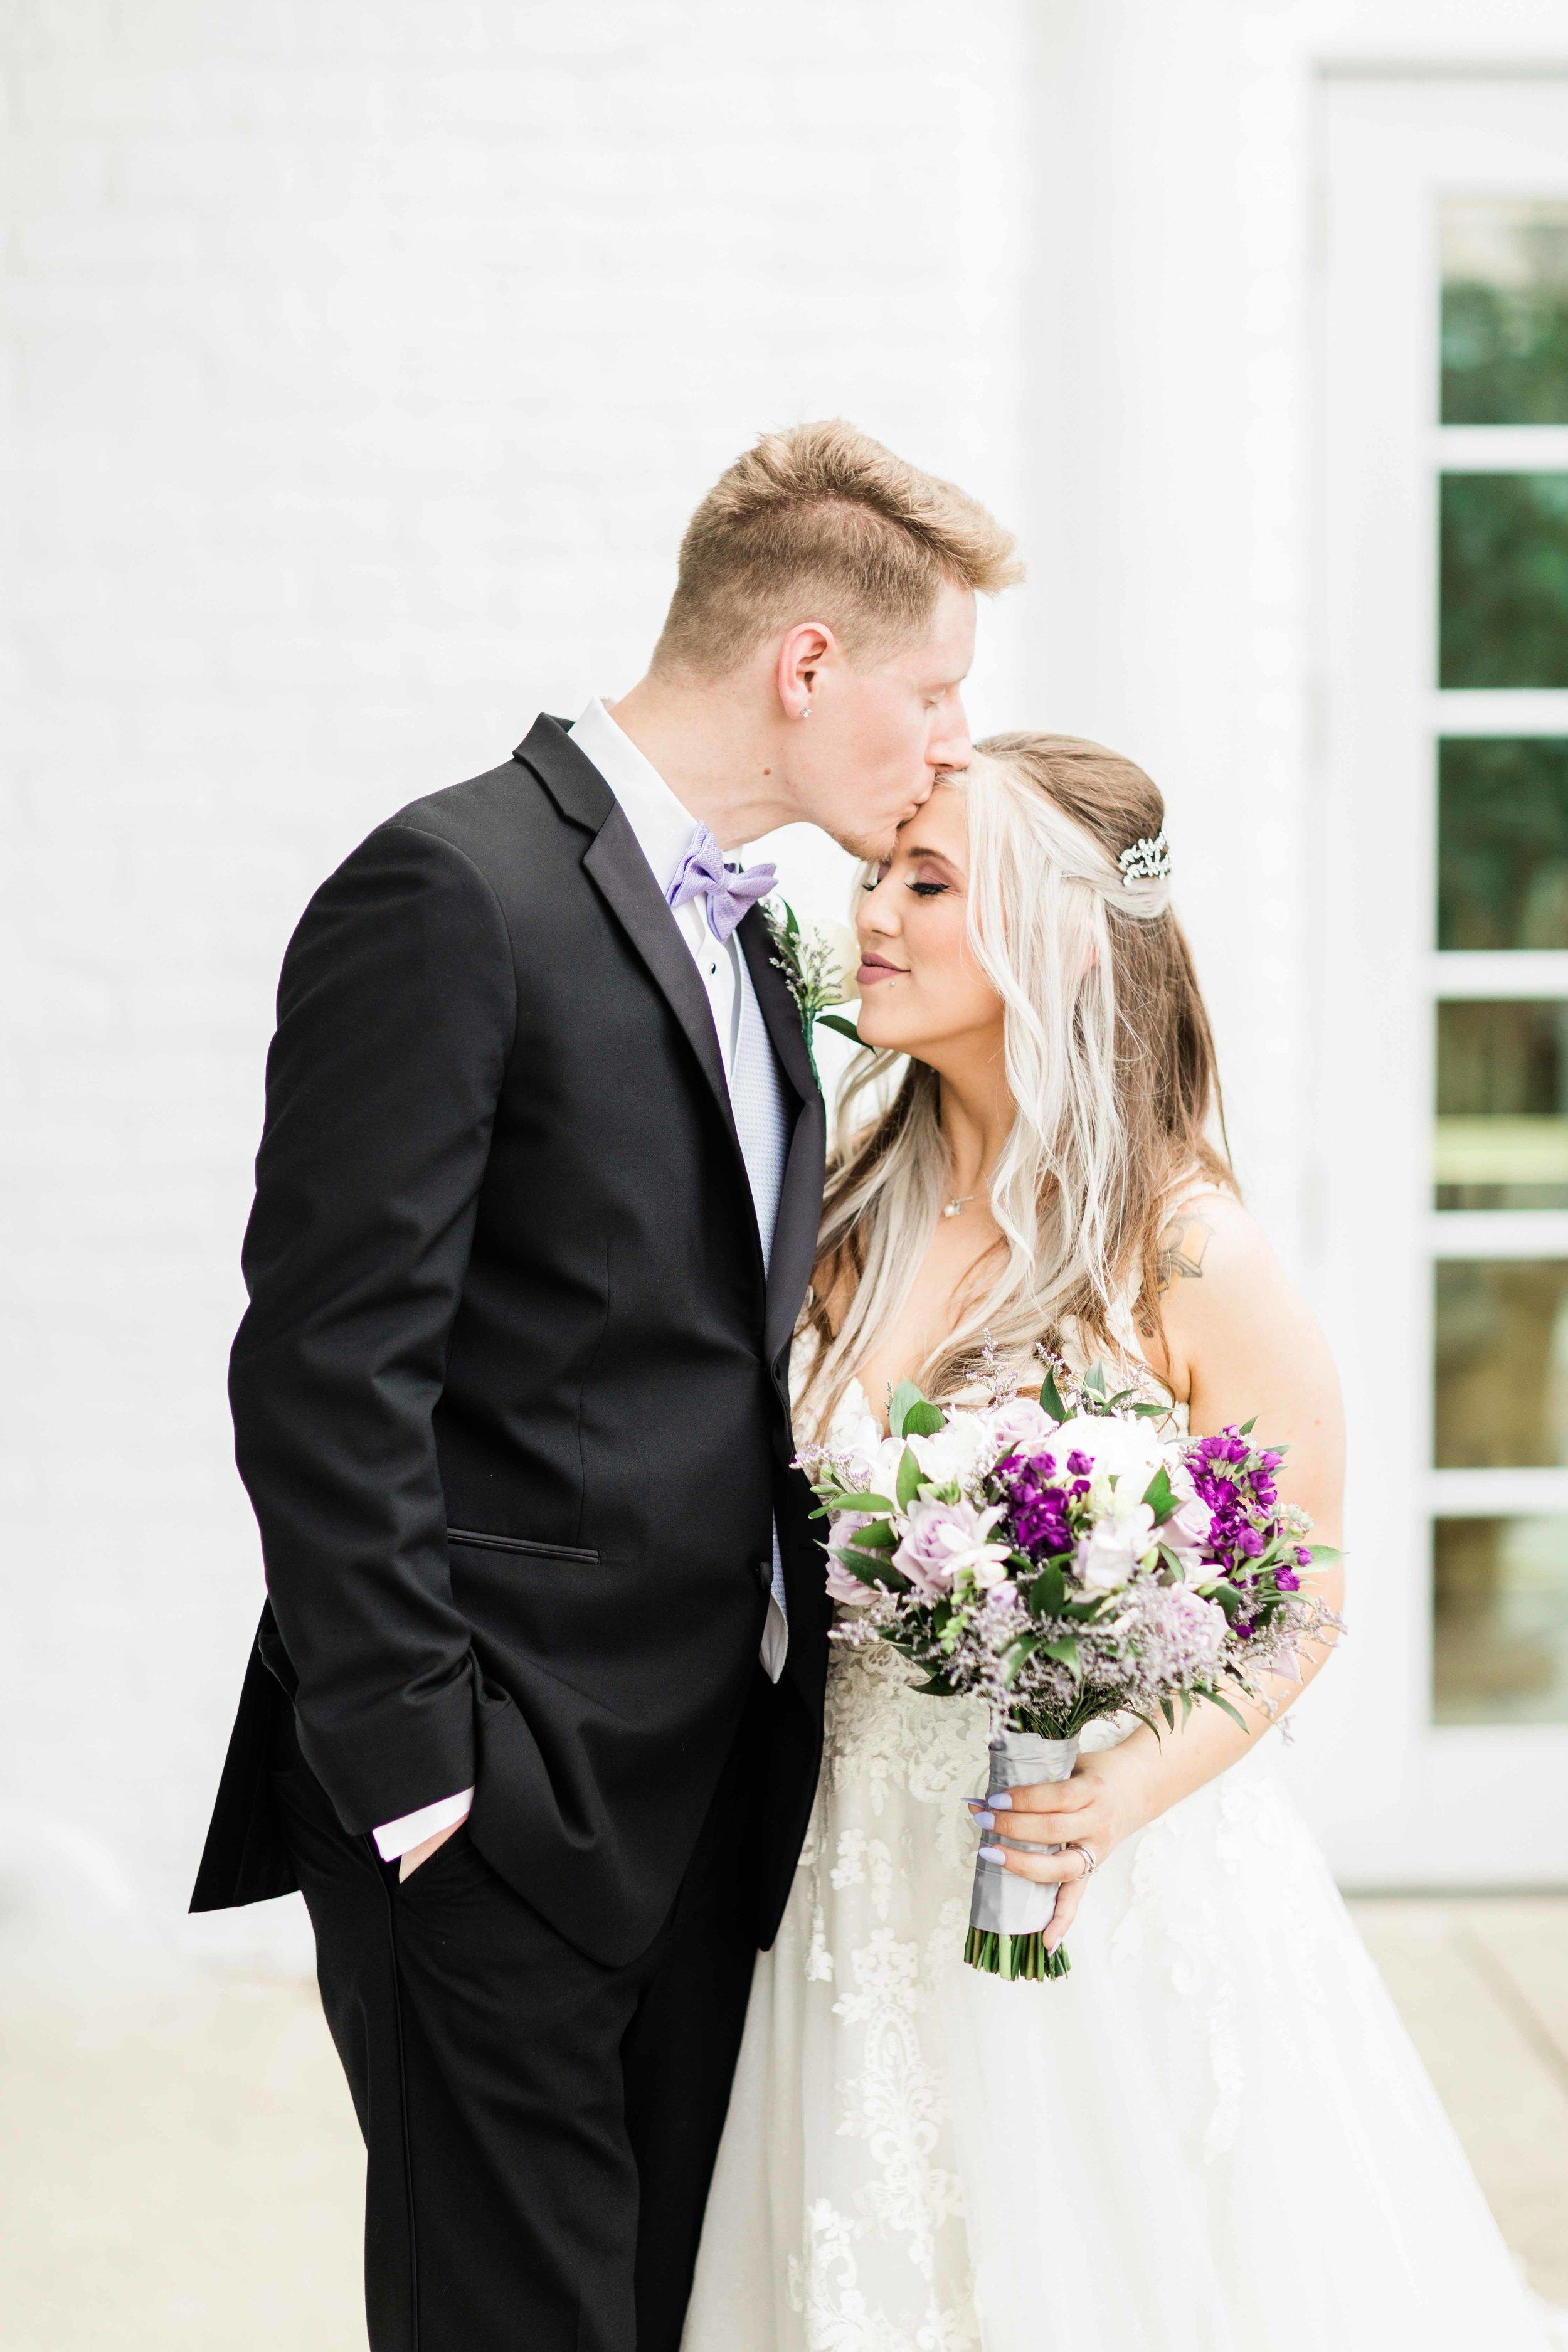 wedding photographers nky southwest ohio cincinnati dayton-3.jpg